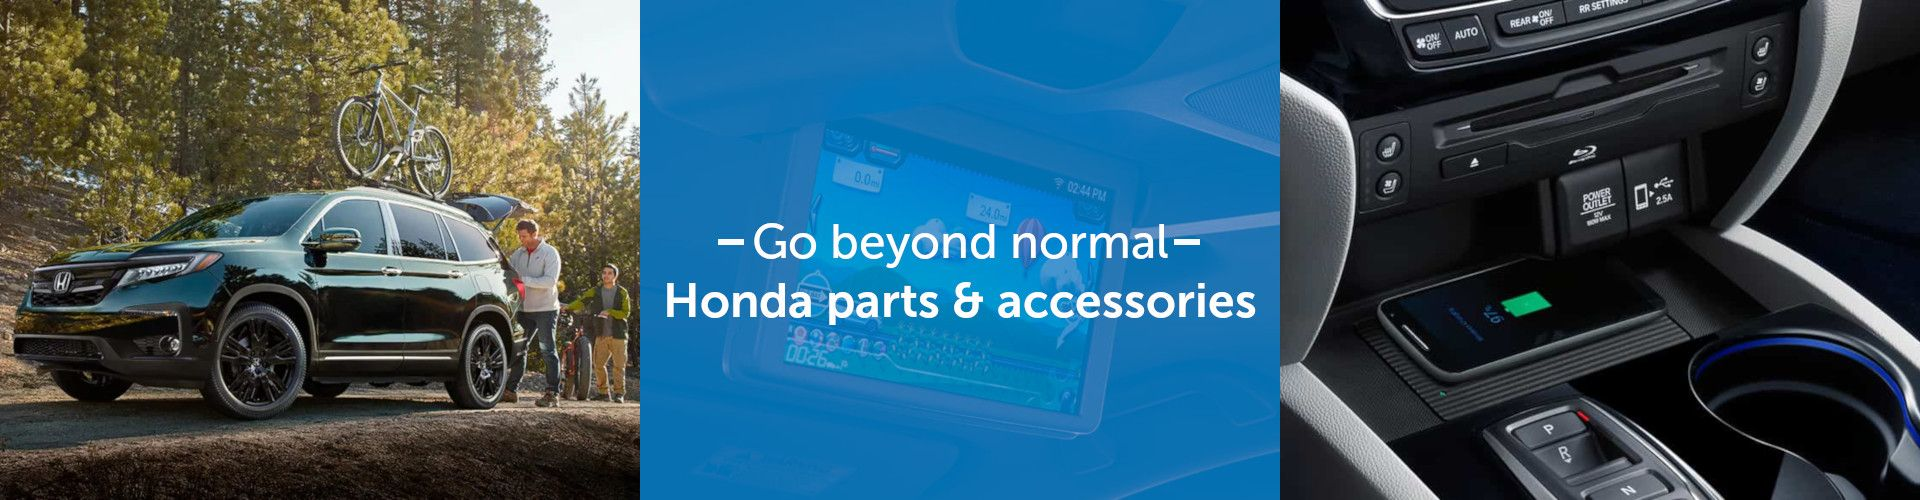 Honda Parts and Accessories